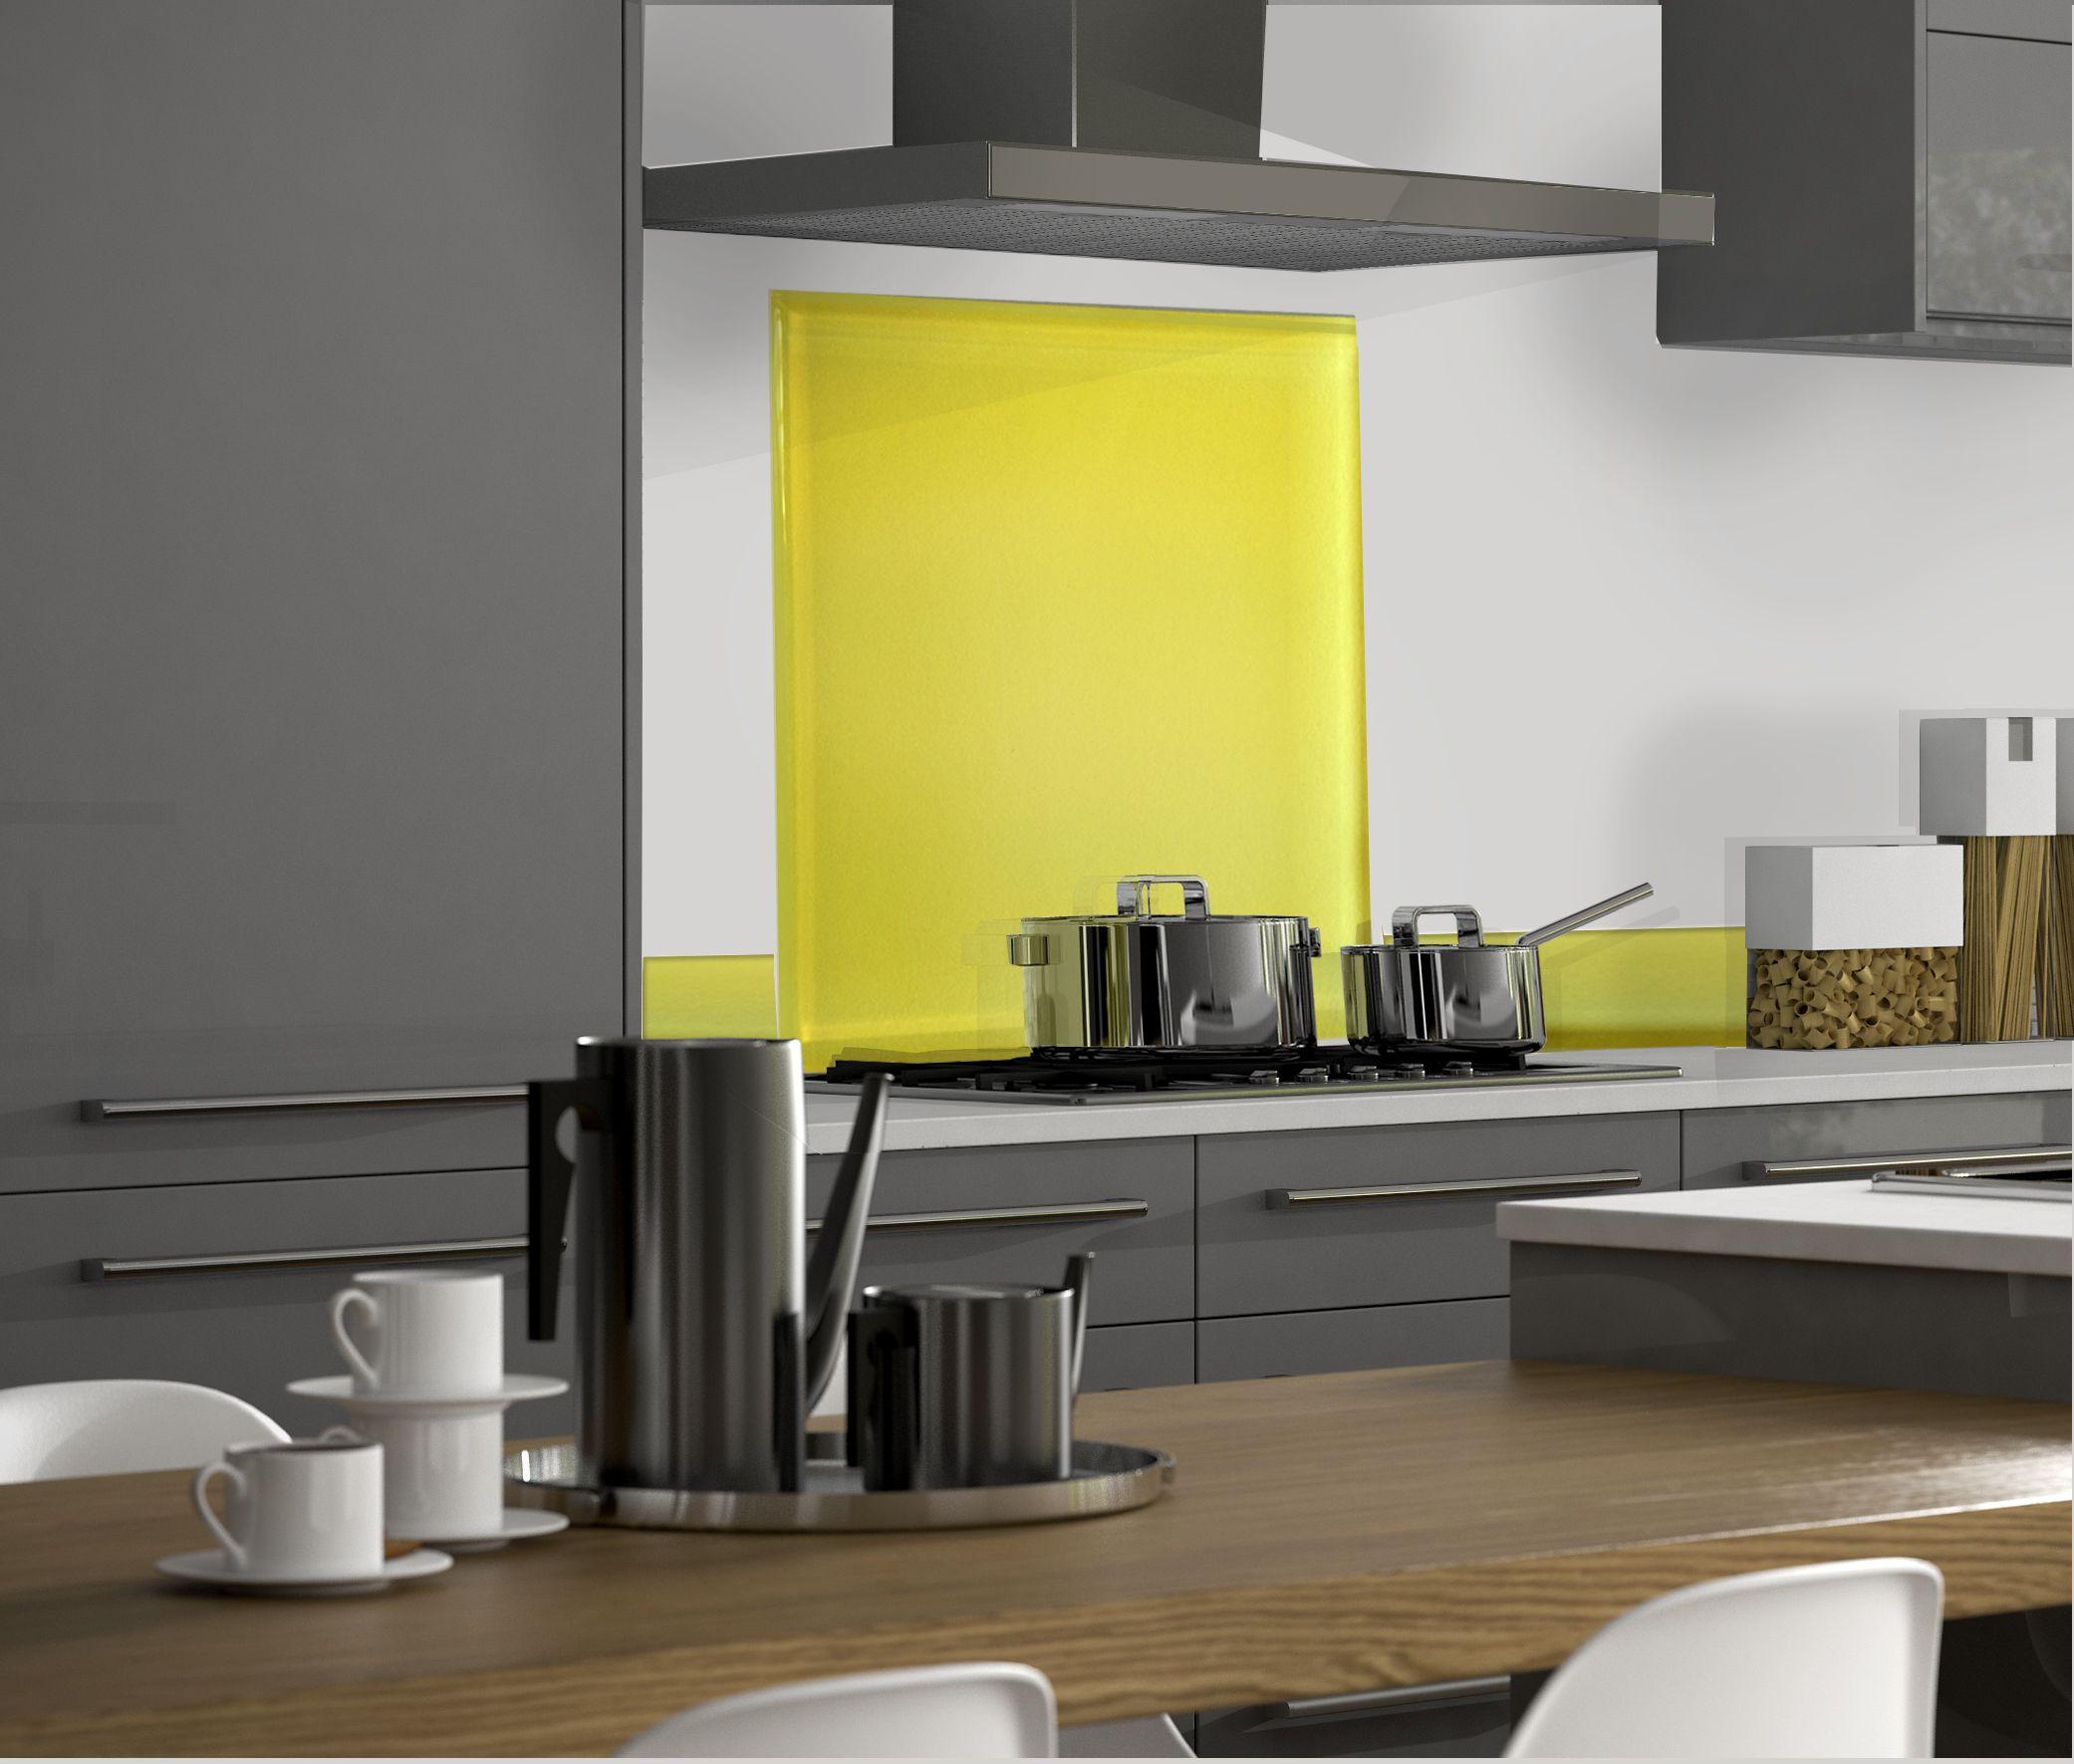 Lemon Glass | Pinterest | Glass splashbacks, Glass and Kitchens